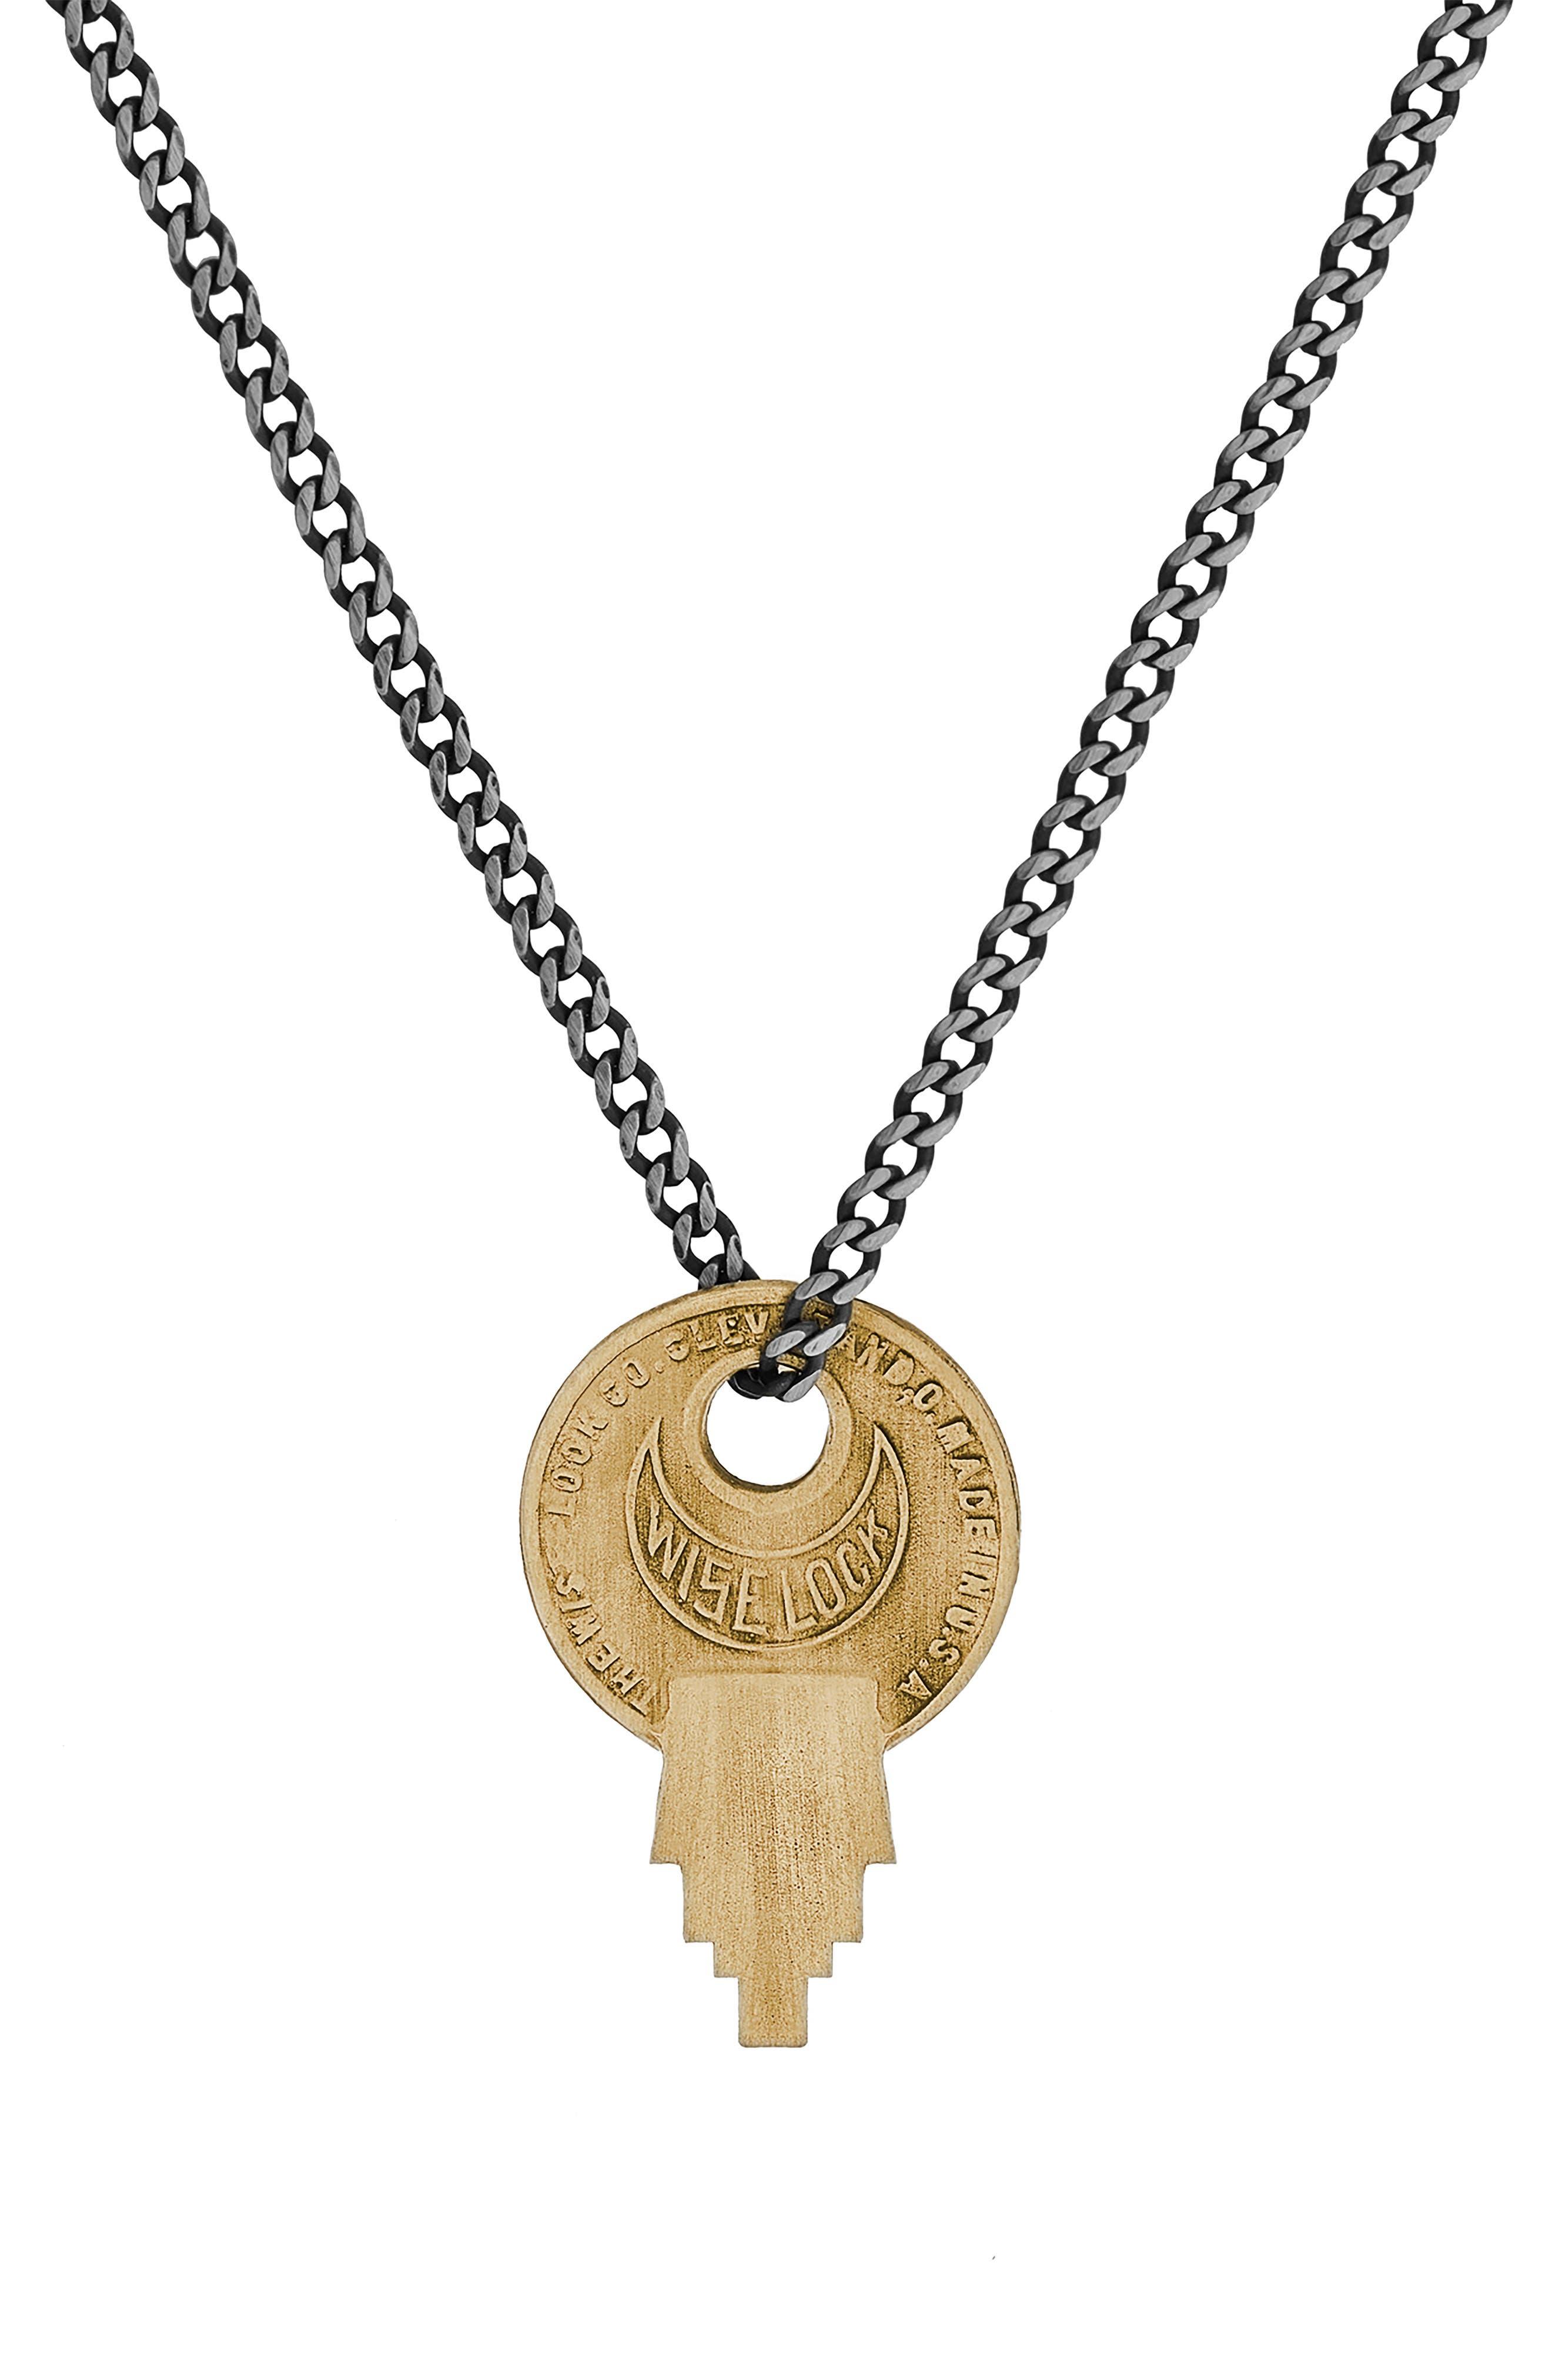 Wise Lock Brass Pendant Necklace,                             Main thumbnail 1, color,                             MATTE BRASS